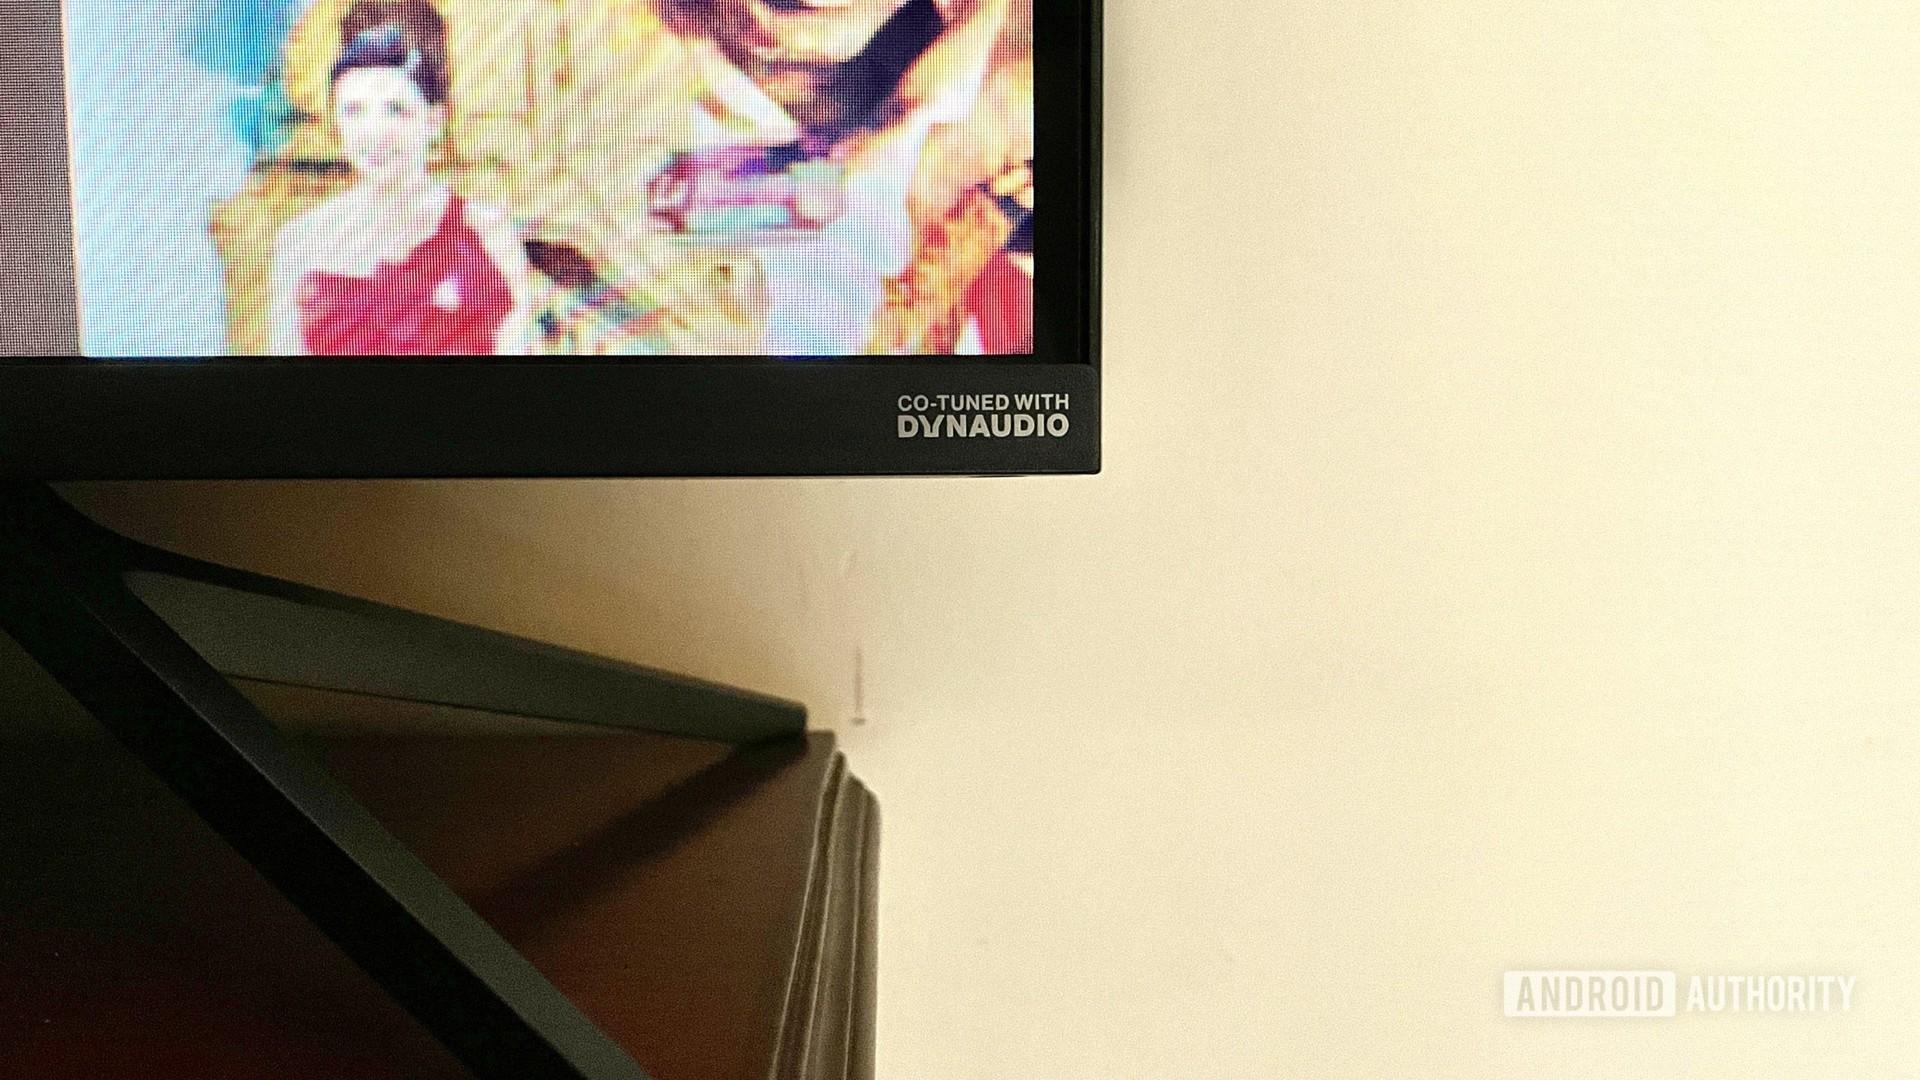 The OnePlus TV U1S Dynaudio.